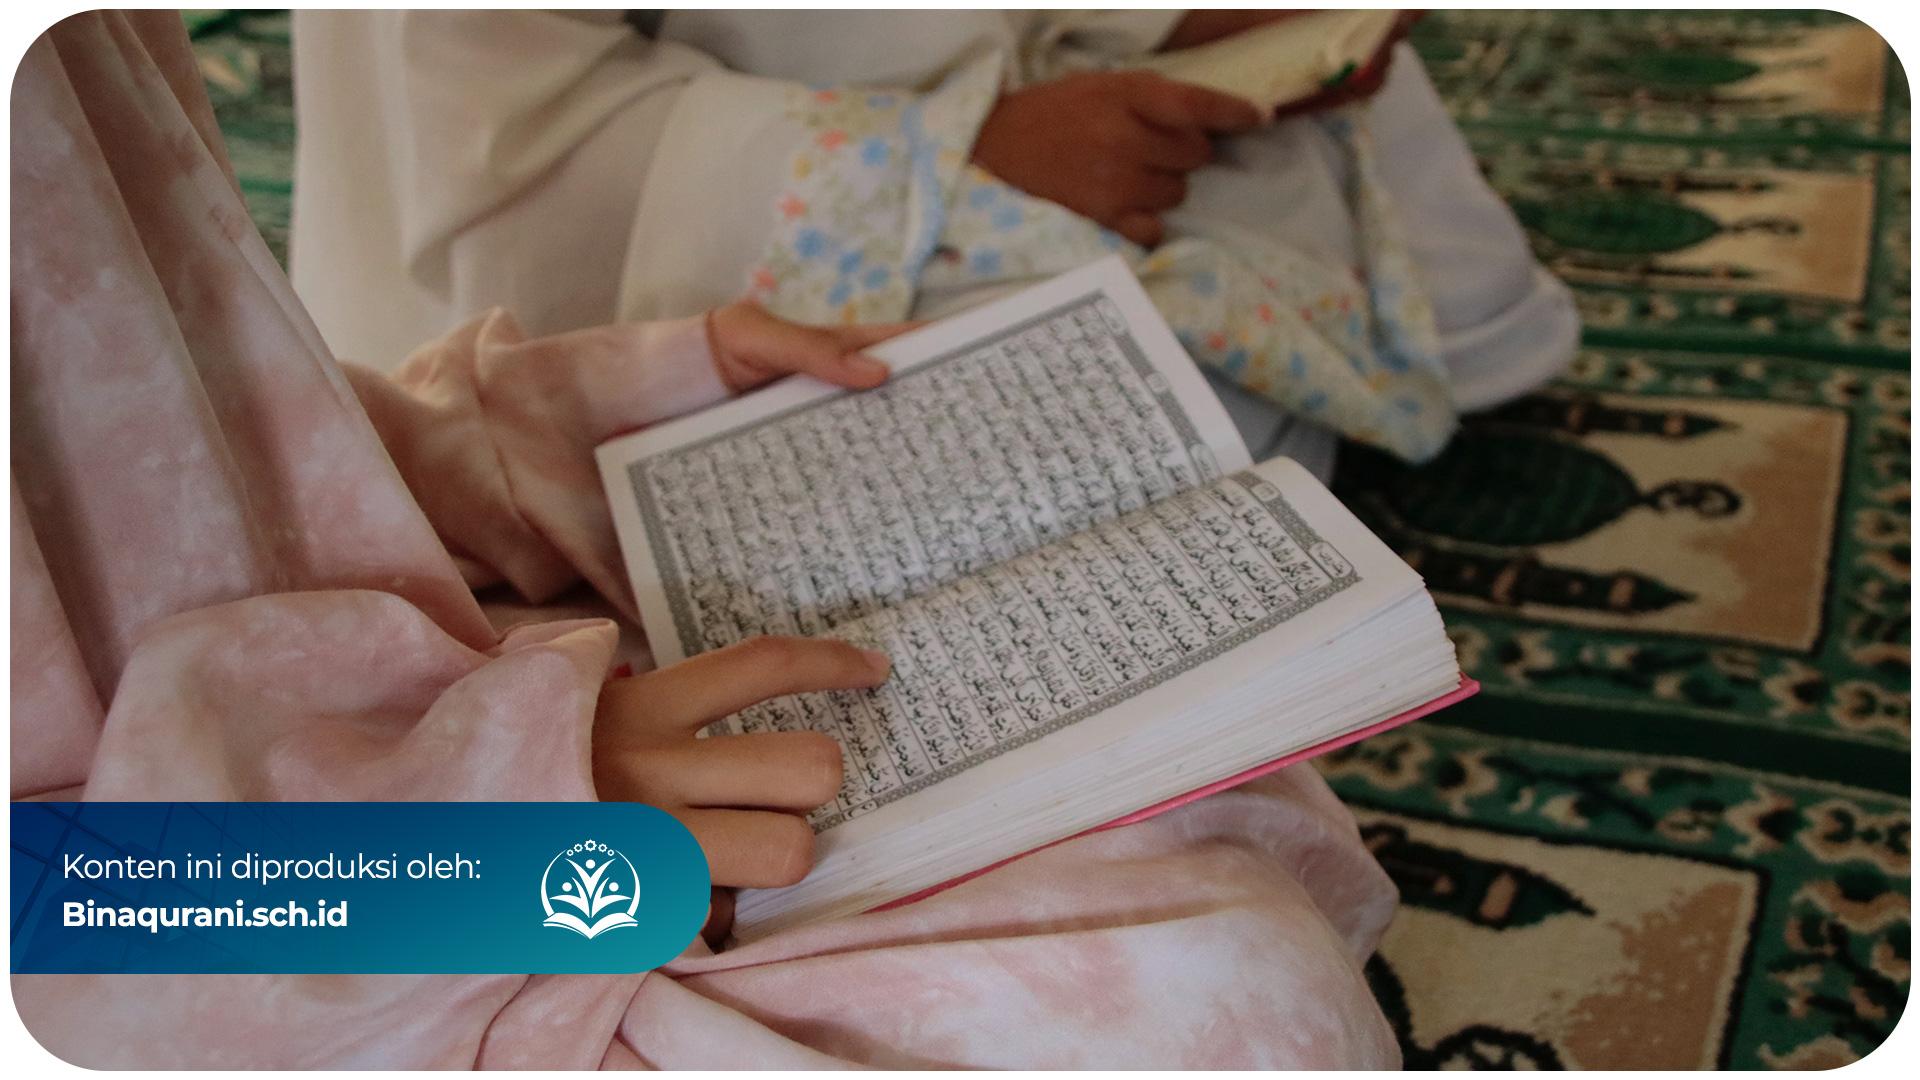 Bina-Qurani-Takzim-Terhadap-Ilmu-Dan-Ahli-Ilmu